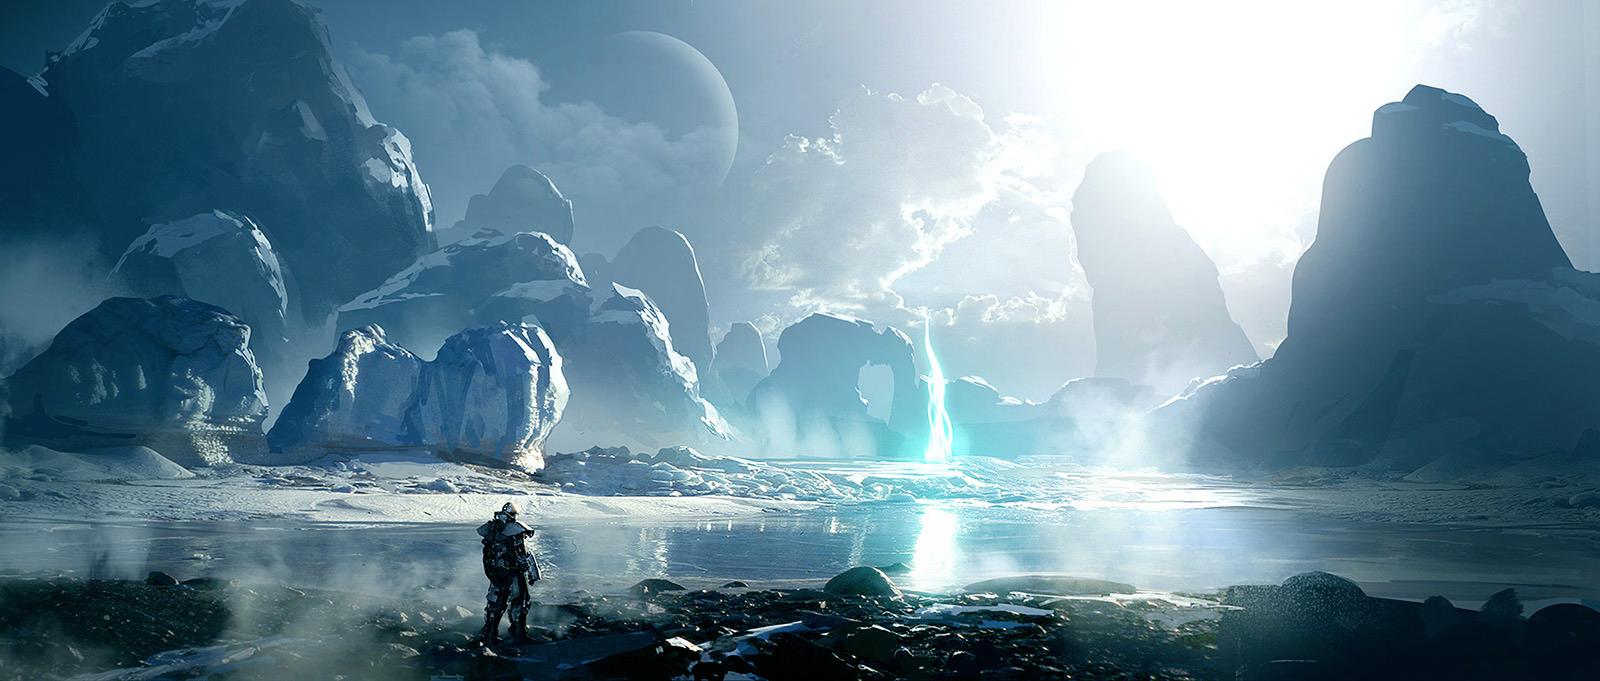 2D Art: Ice Planet - 2D Digital, Scenery/Landscapes, Sci